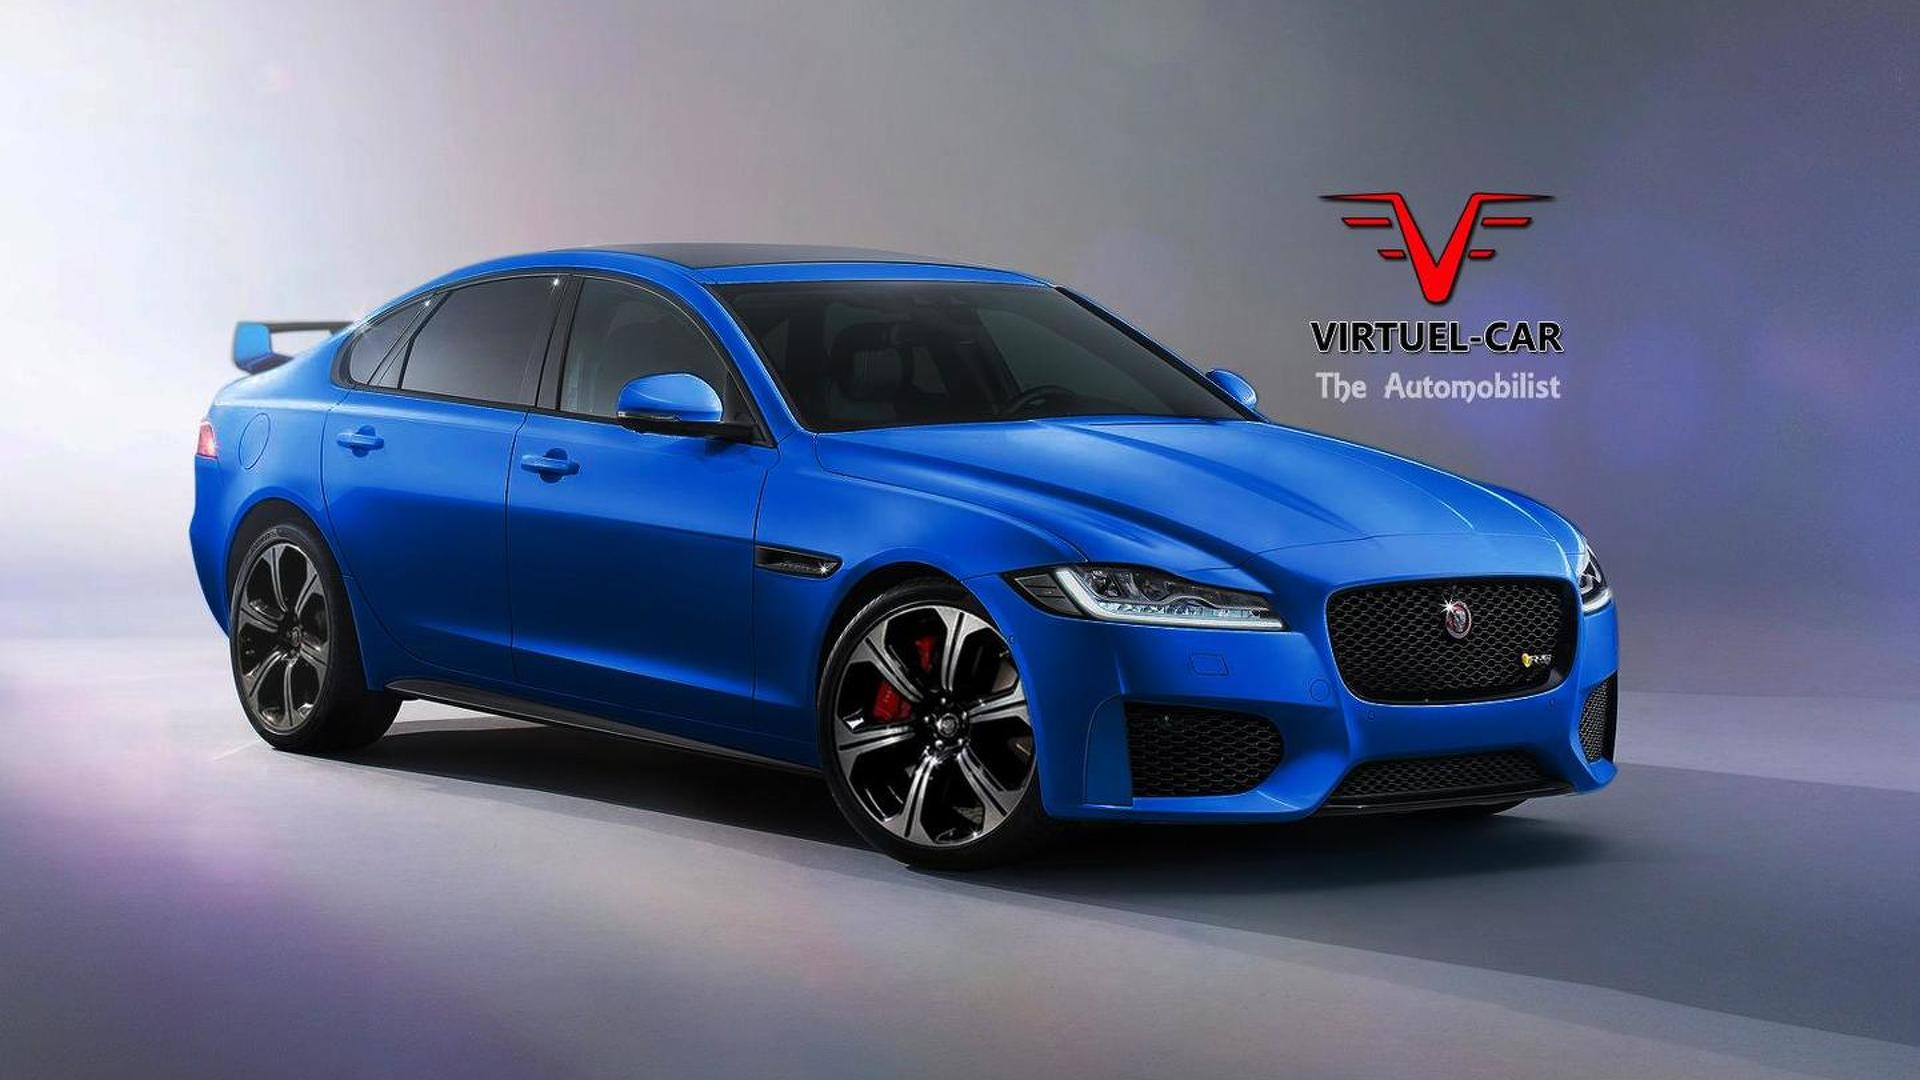 Jaguar XFR-S rendering previews a very possible look